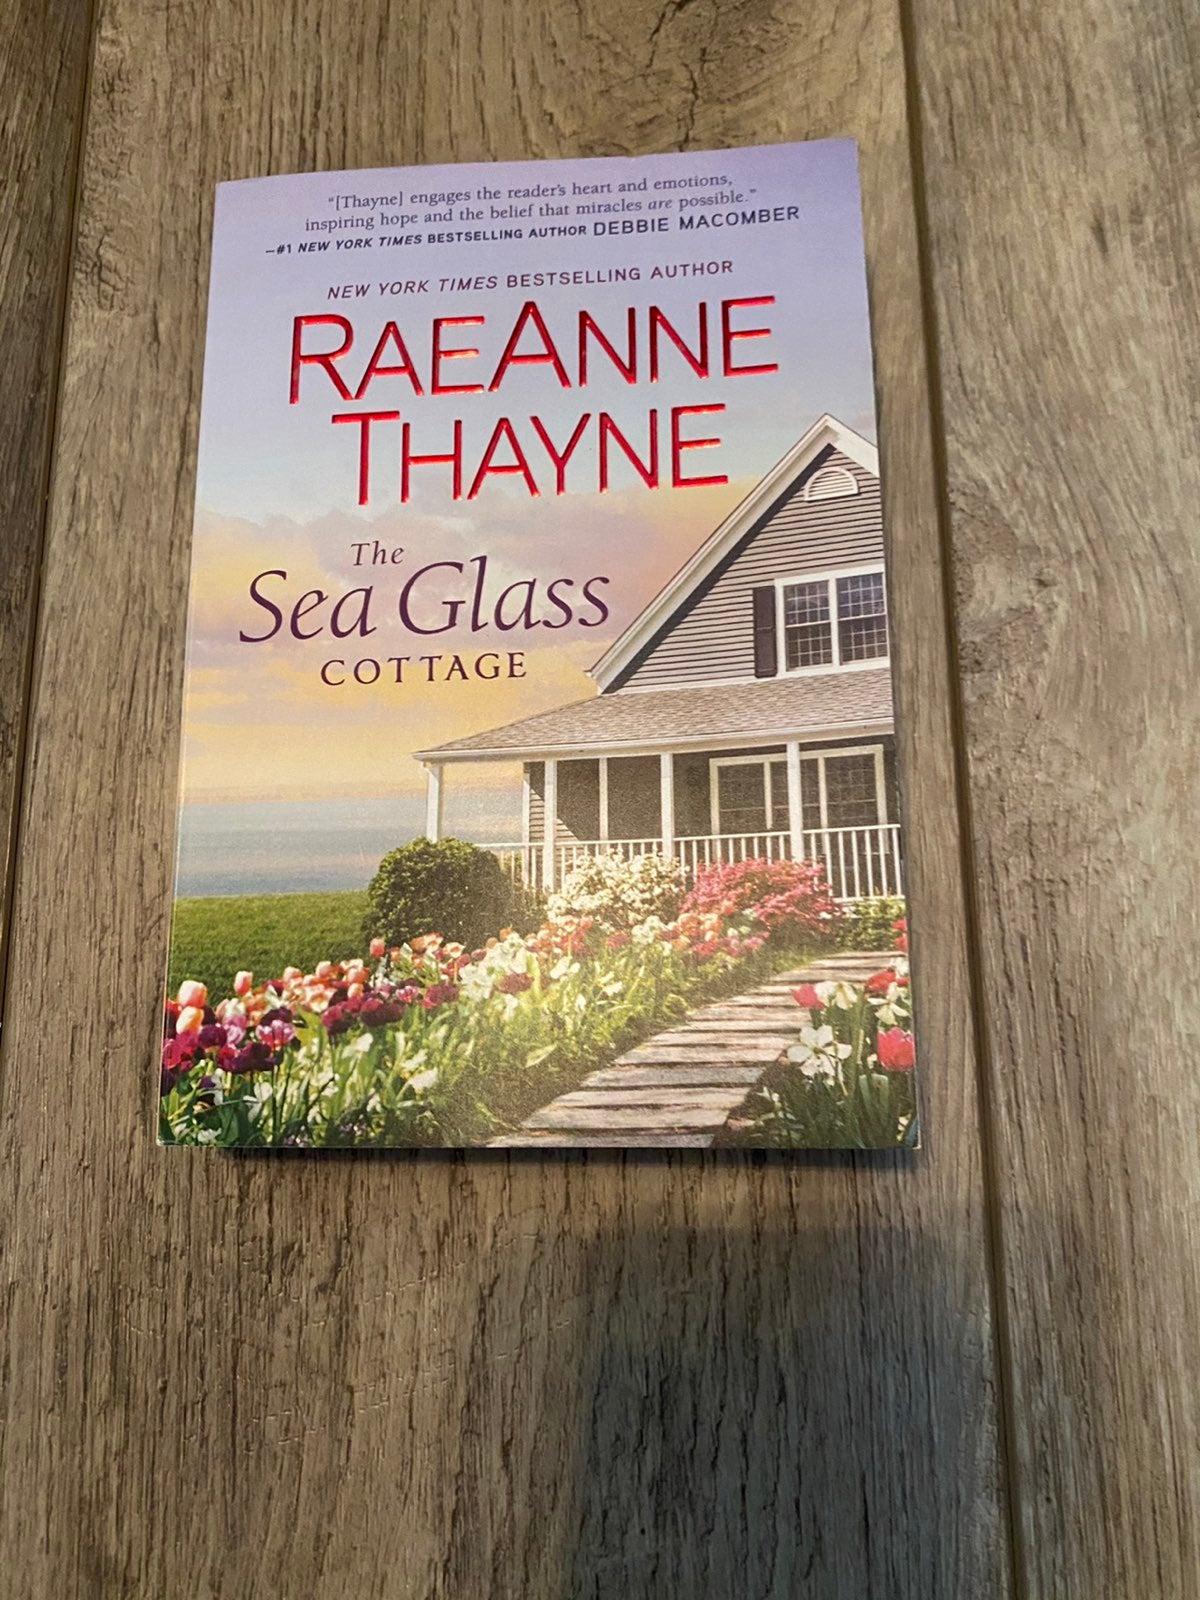 The sea glass cottage RaeAnne Thayne